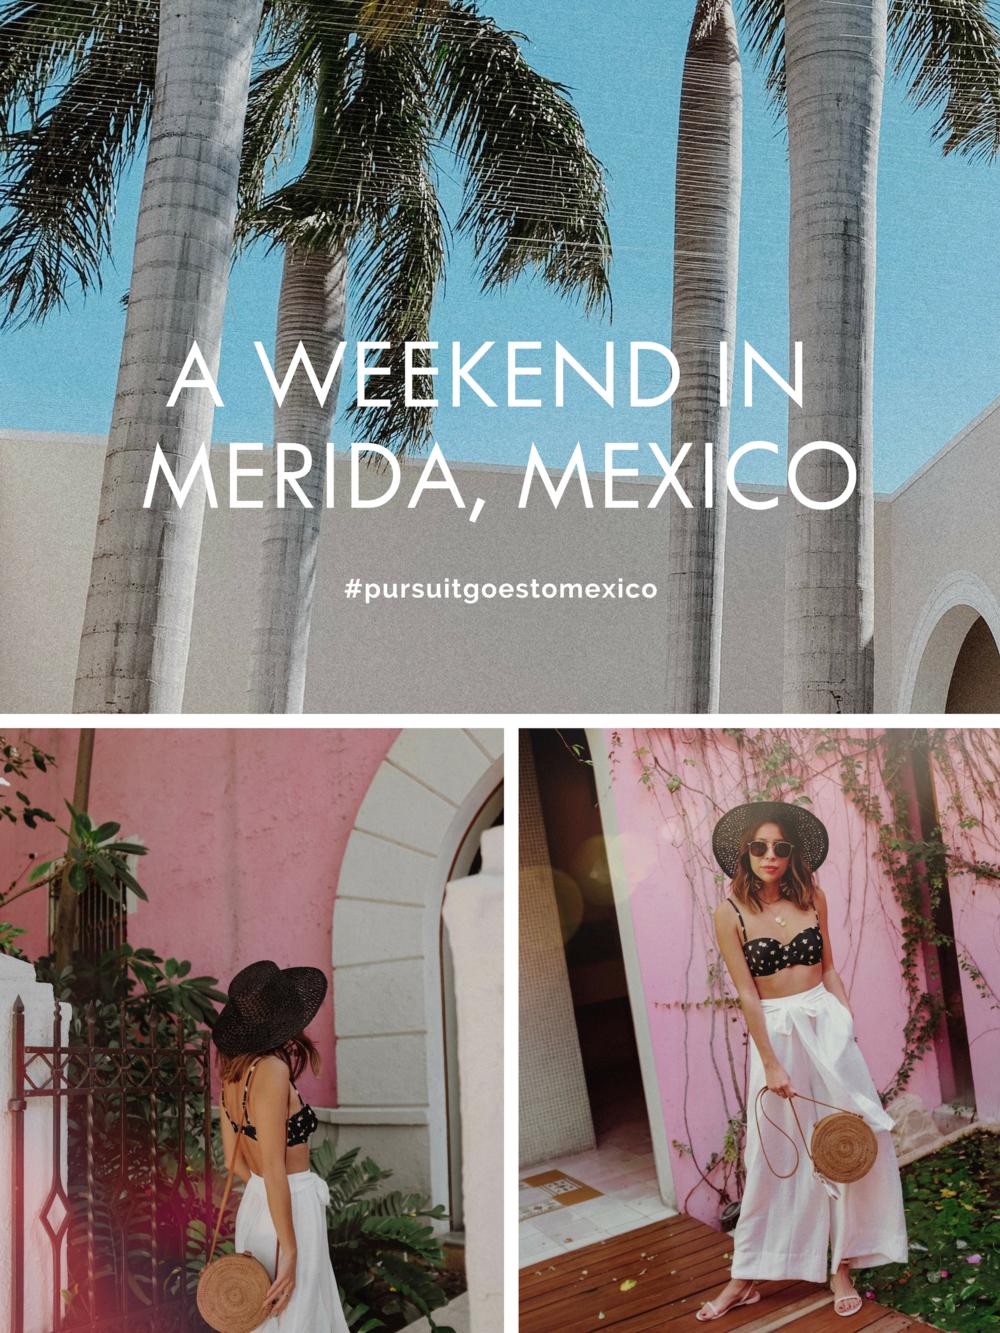 We Wore What Bikini x Onia Bikini for Merida, Mexico